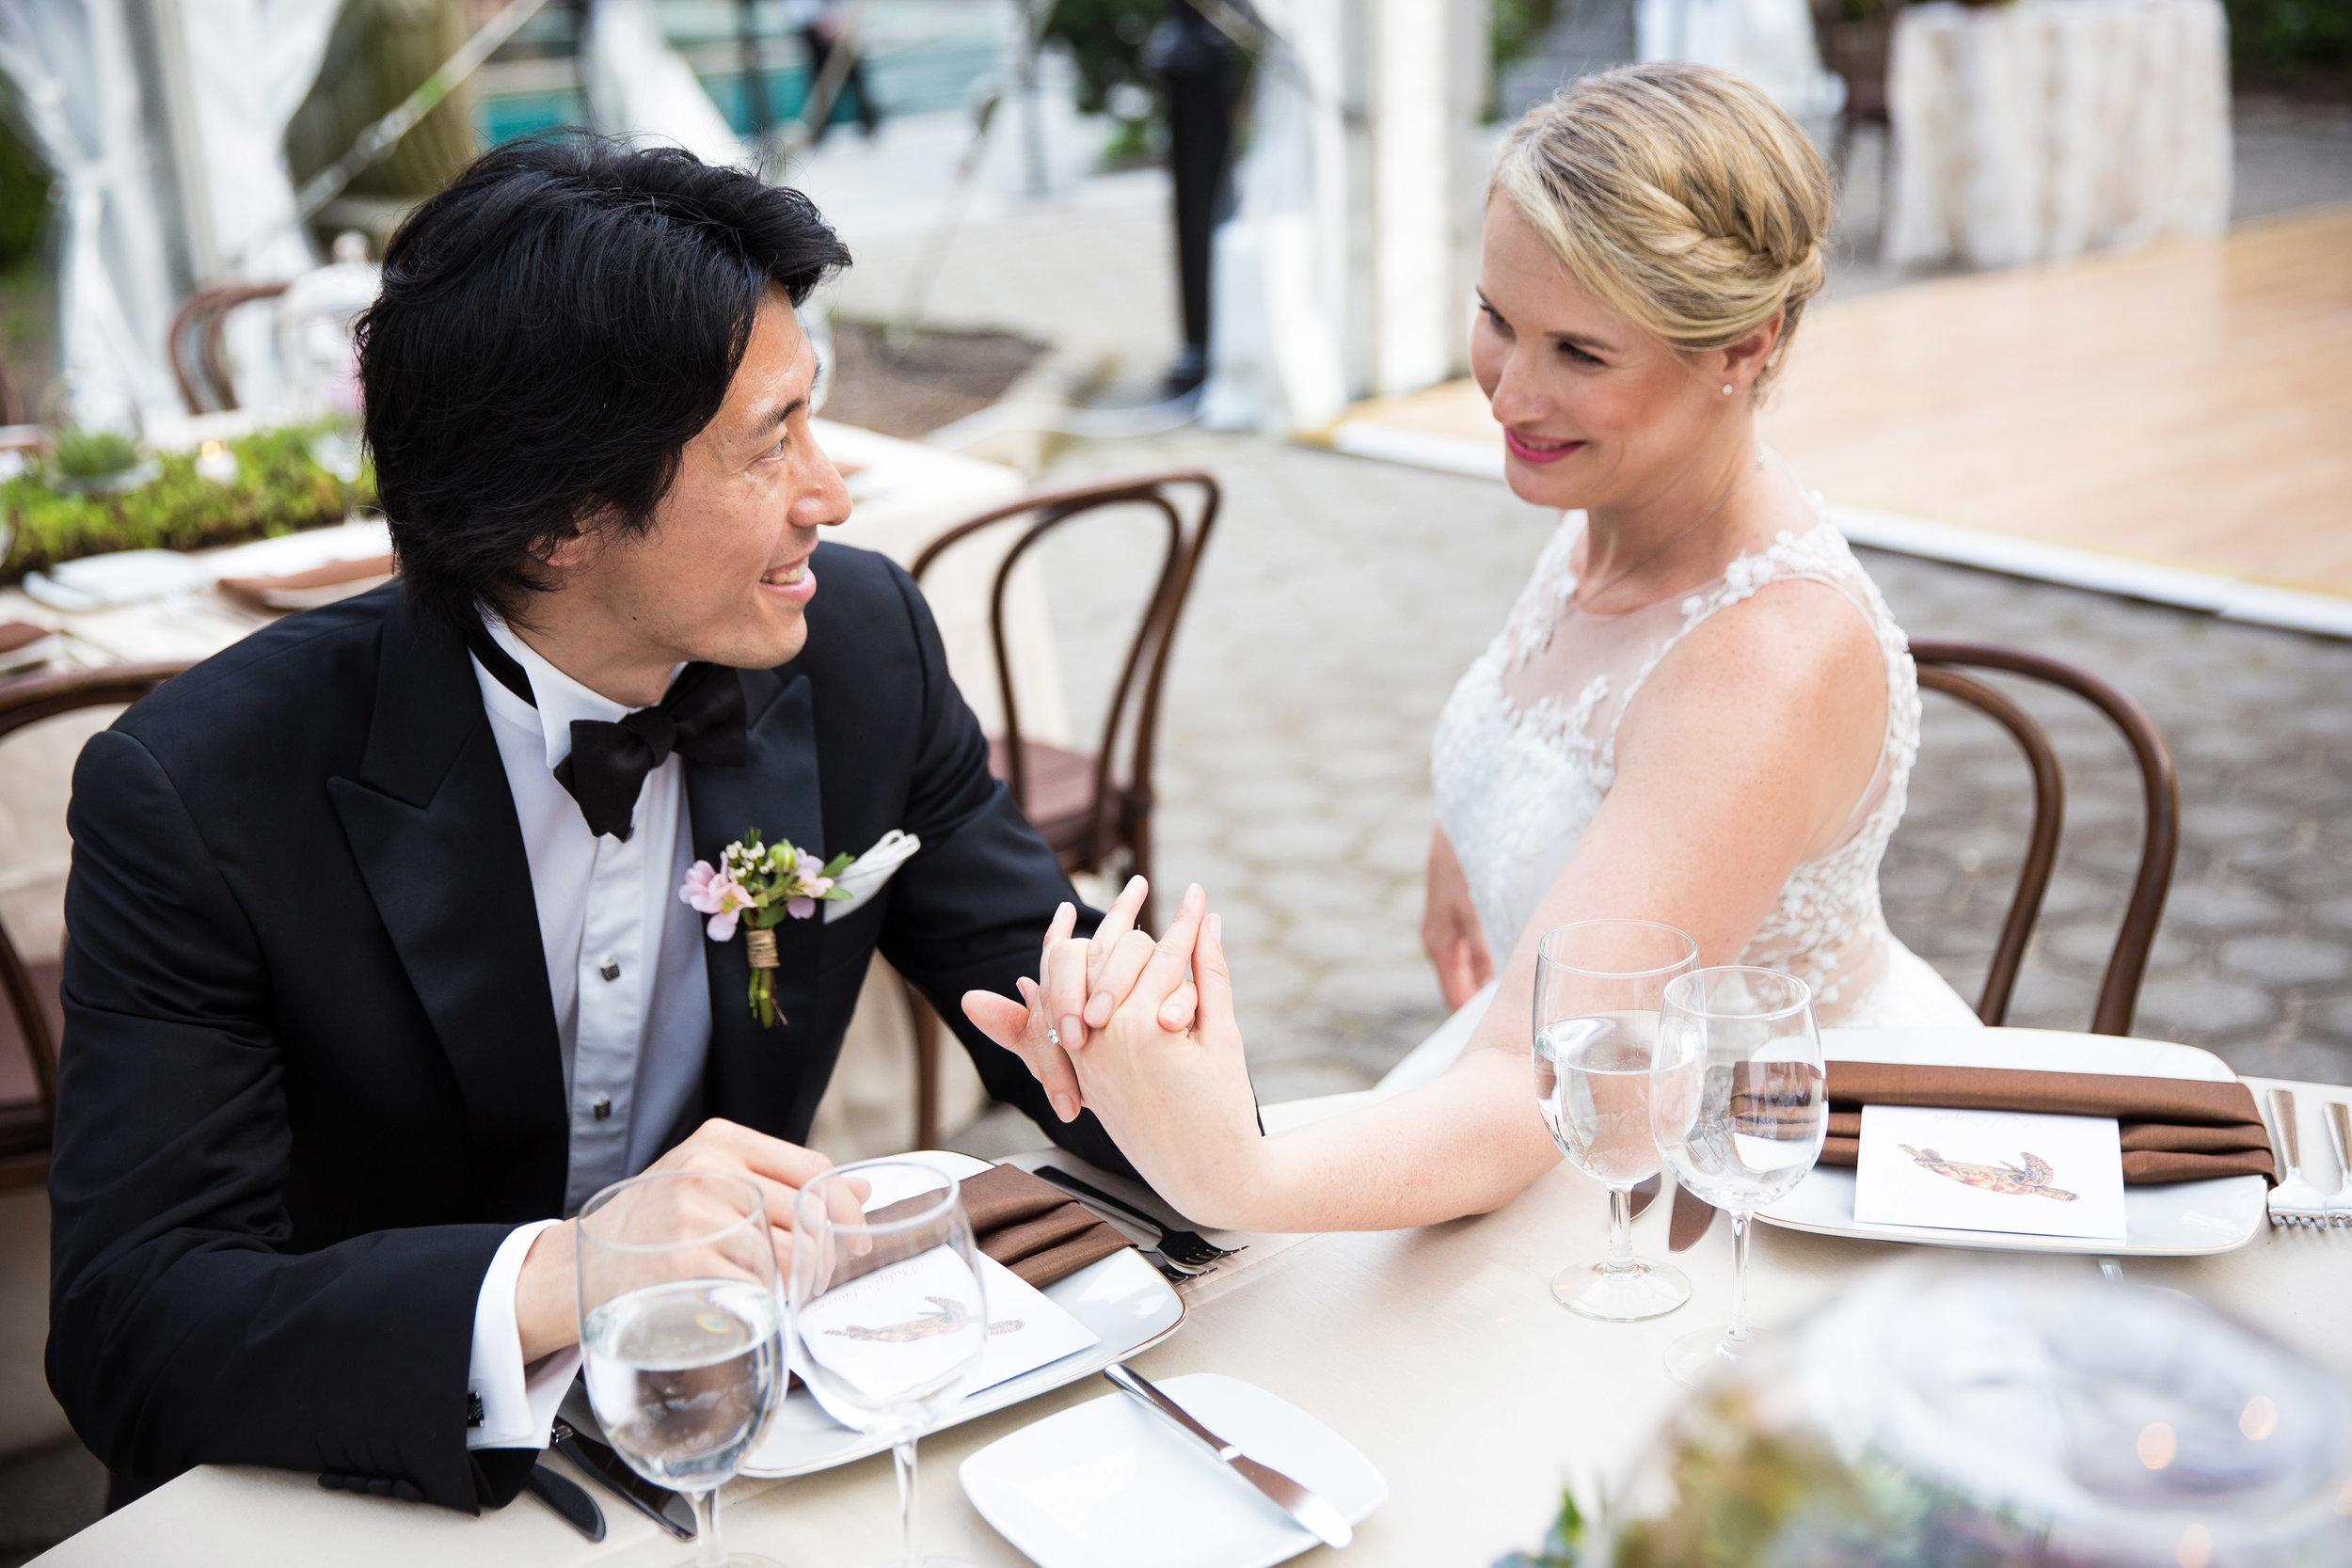 victorious-events-nyc-001-colleen-taka-central-park-zoo-wedding-raymond-hamlin.jpg